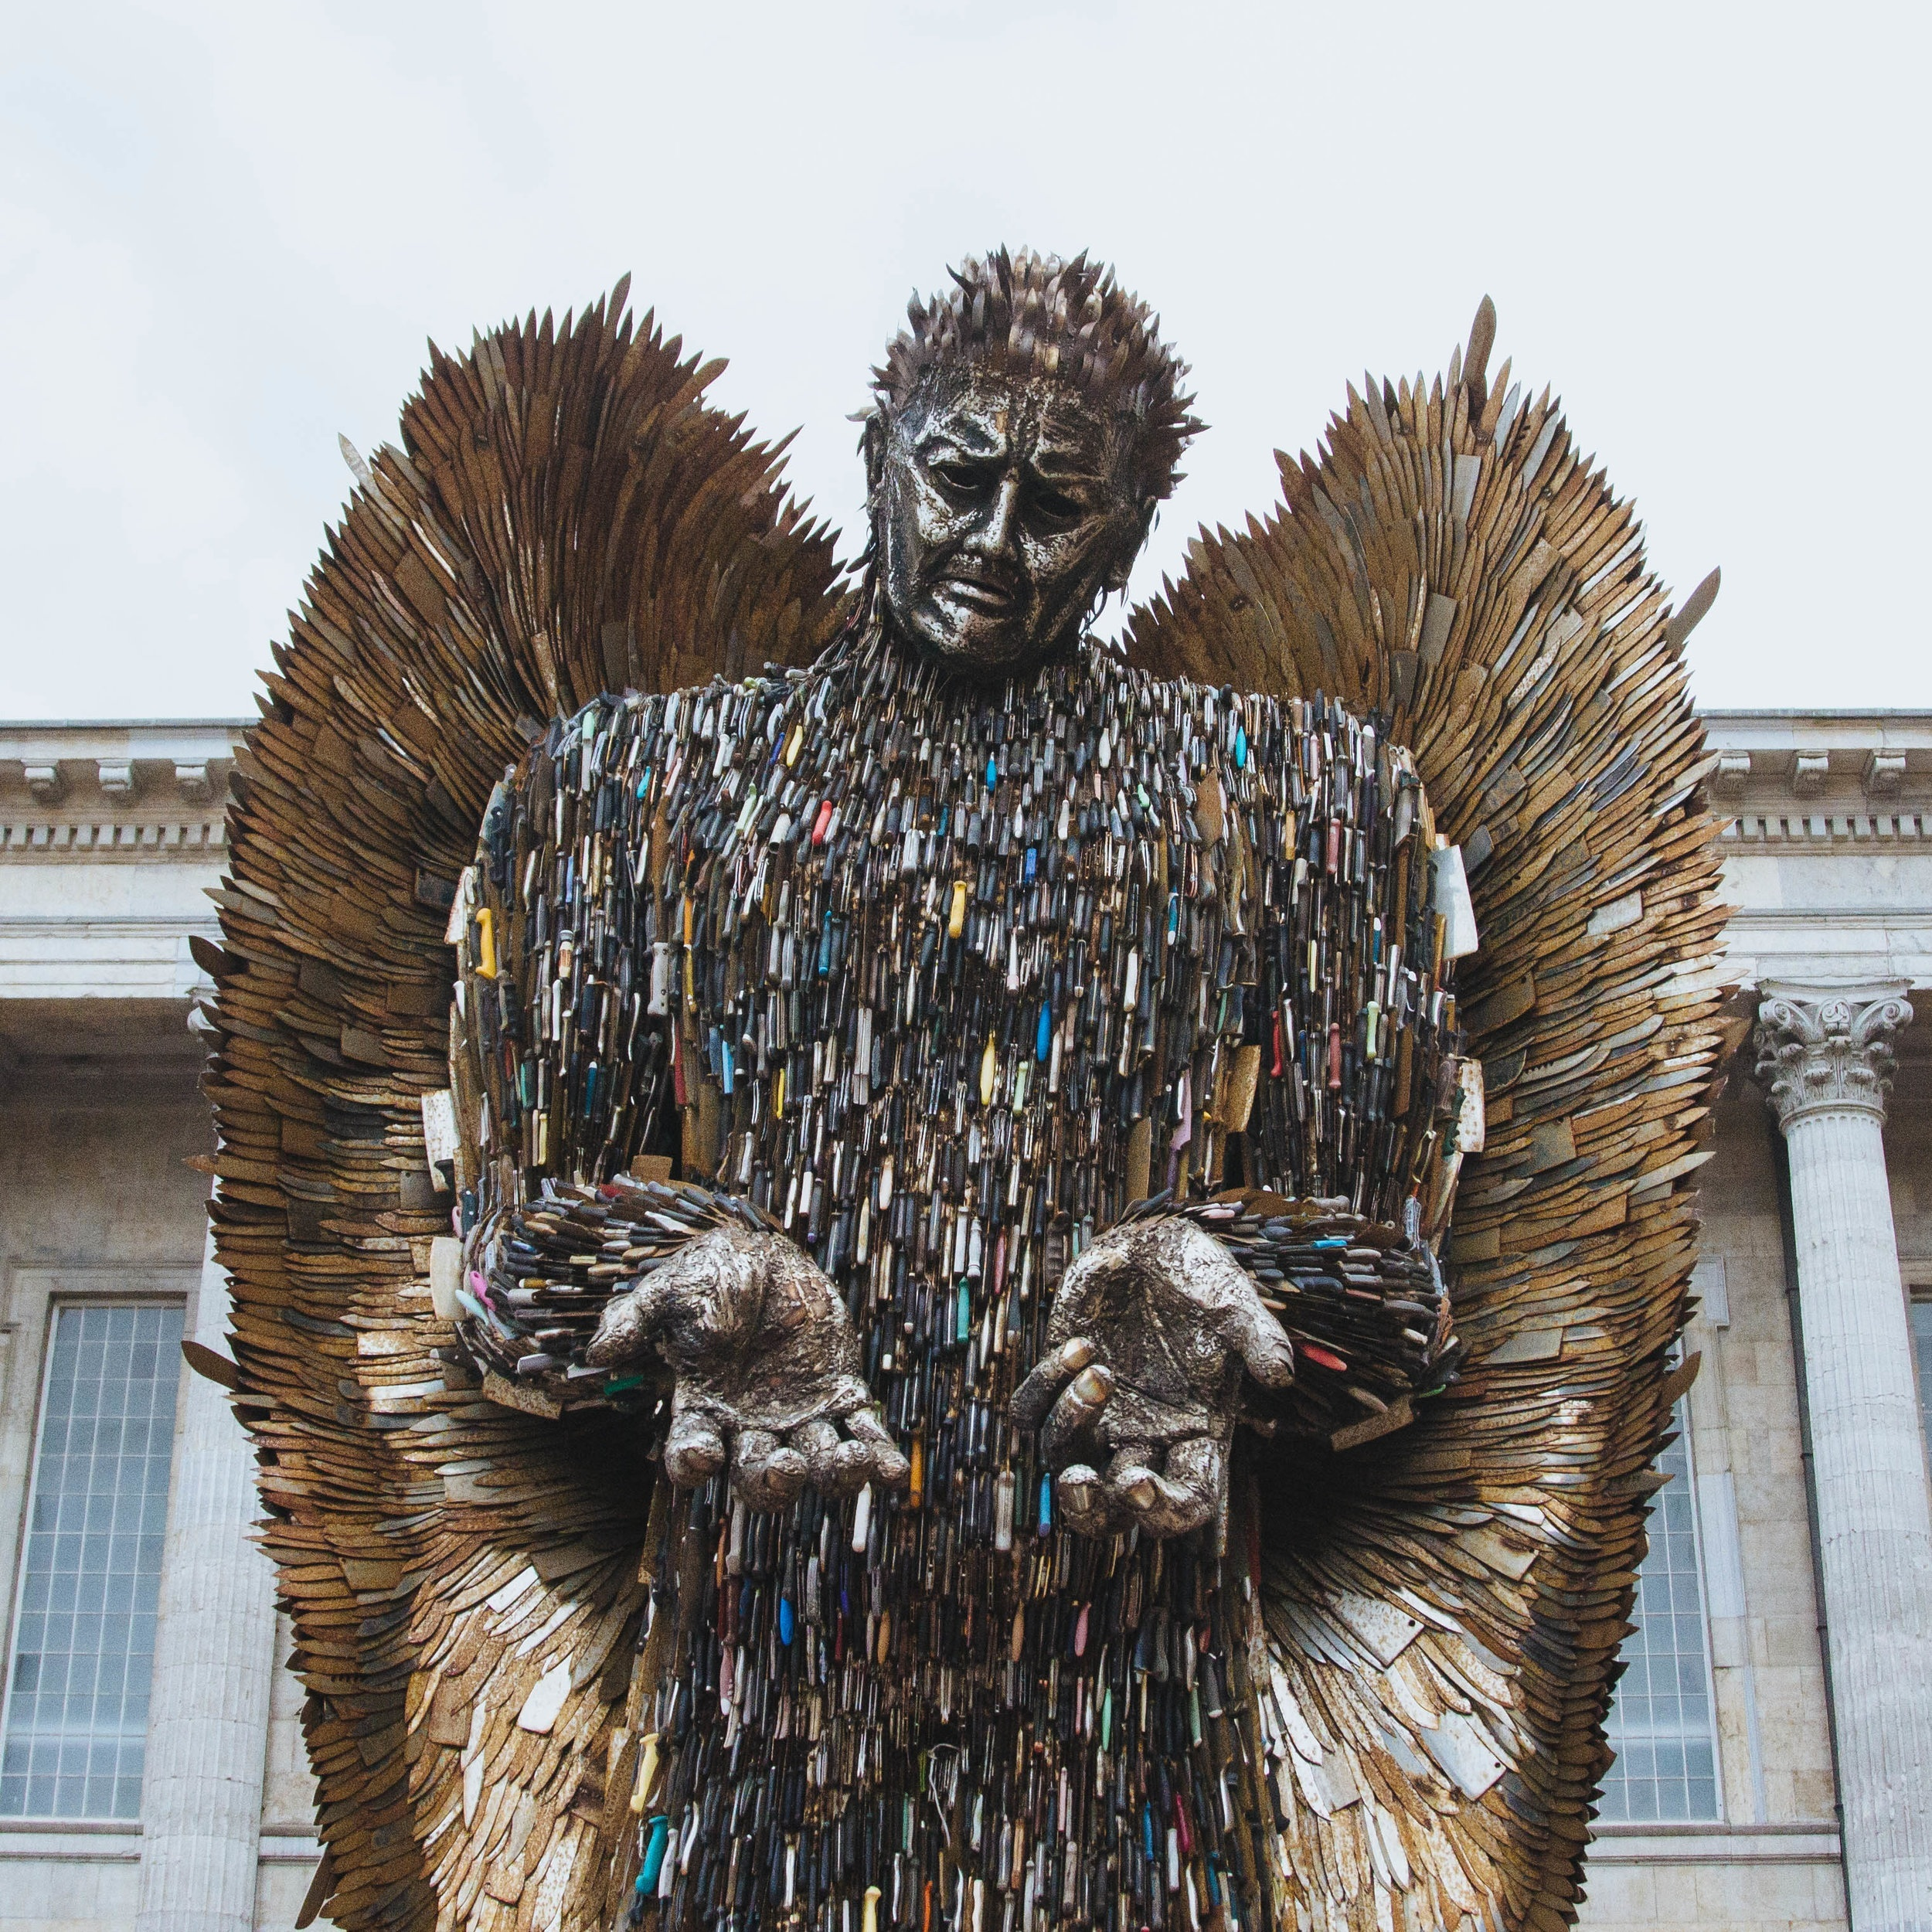 The Knife Angel by Alfie Bradley